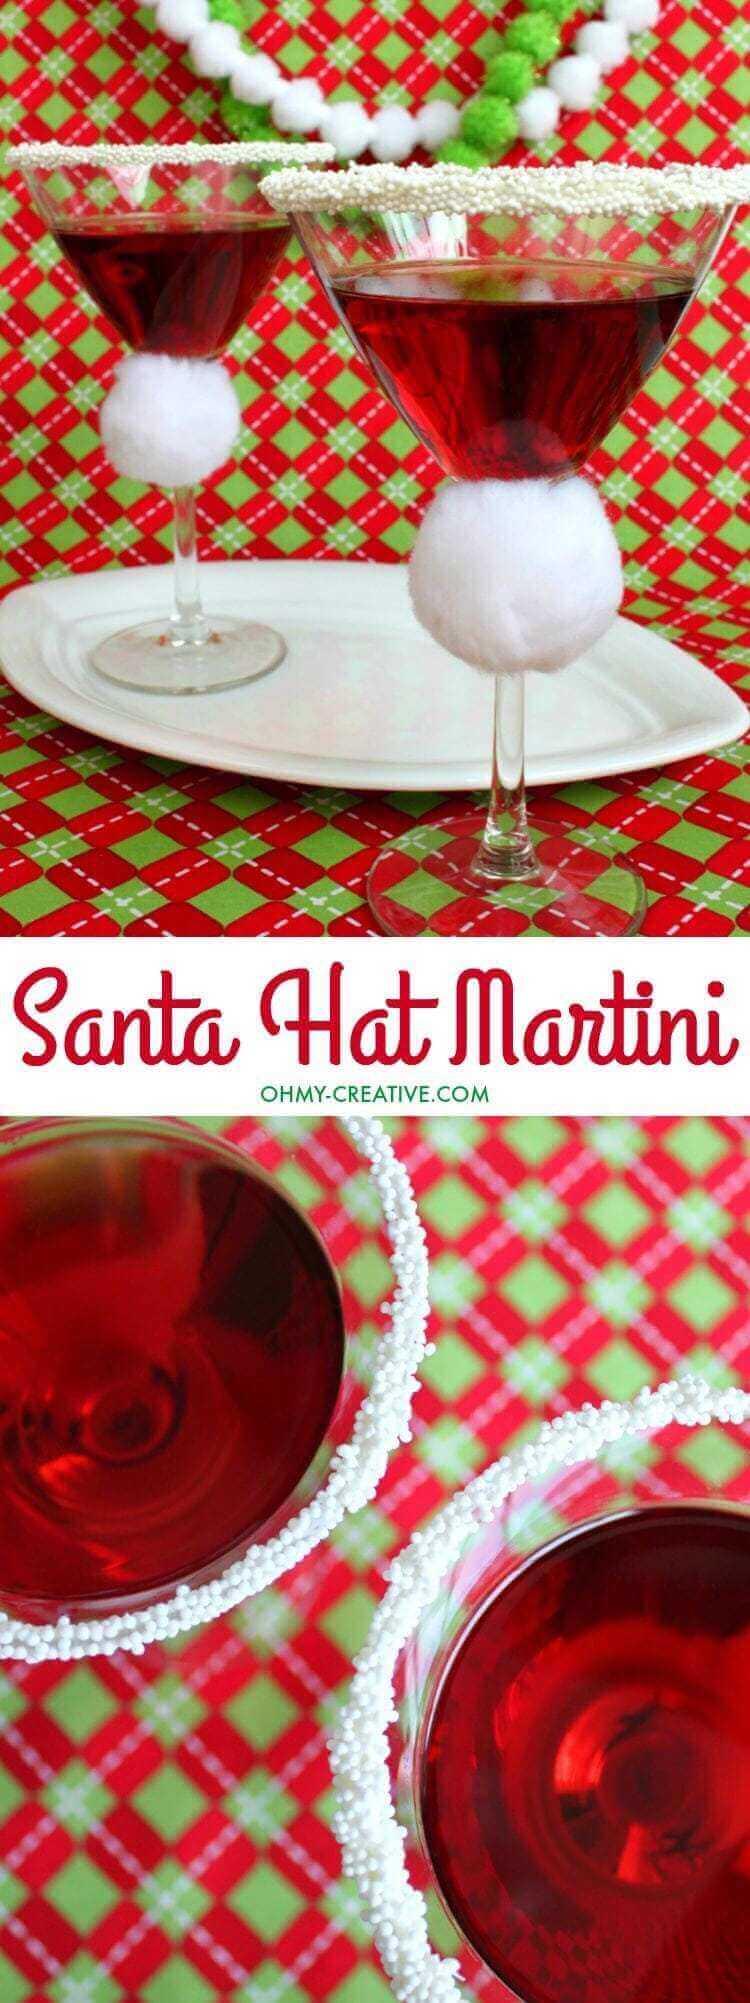 Santa Hat Martini